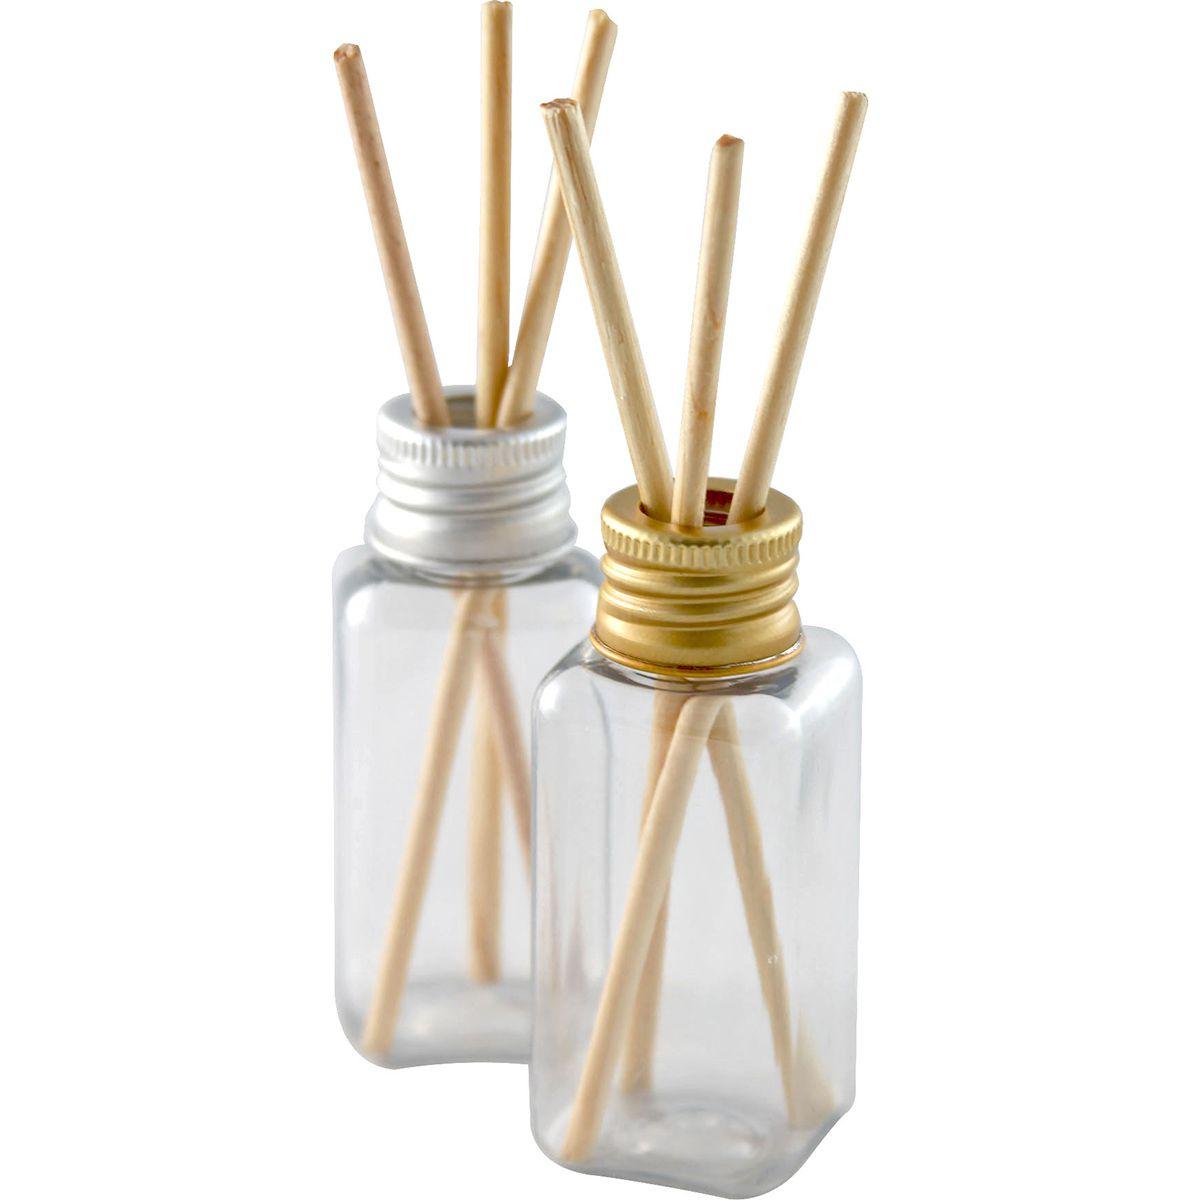 Frasco para Aromatizador Atacado Plástico de 40 ml kit com 125 unidades